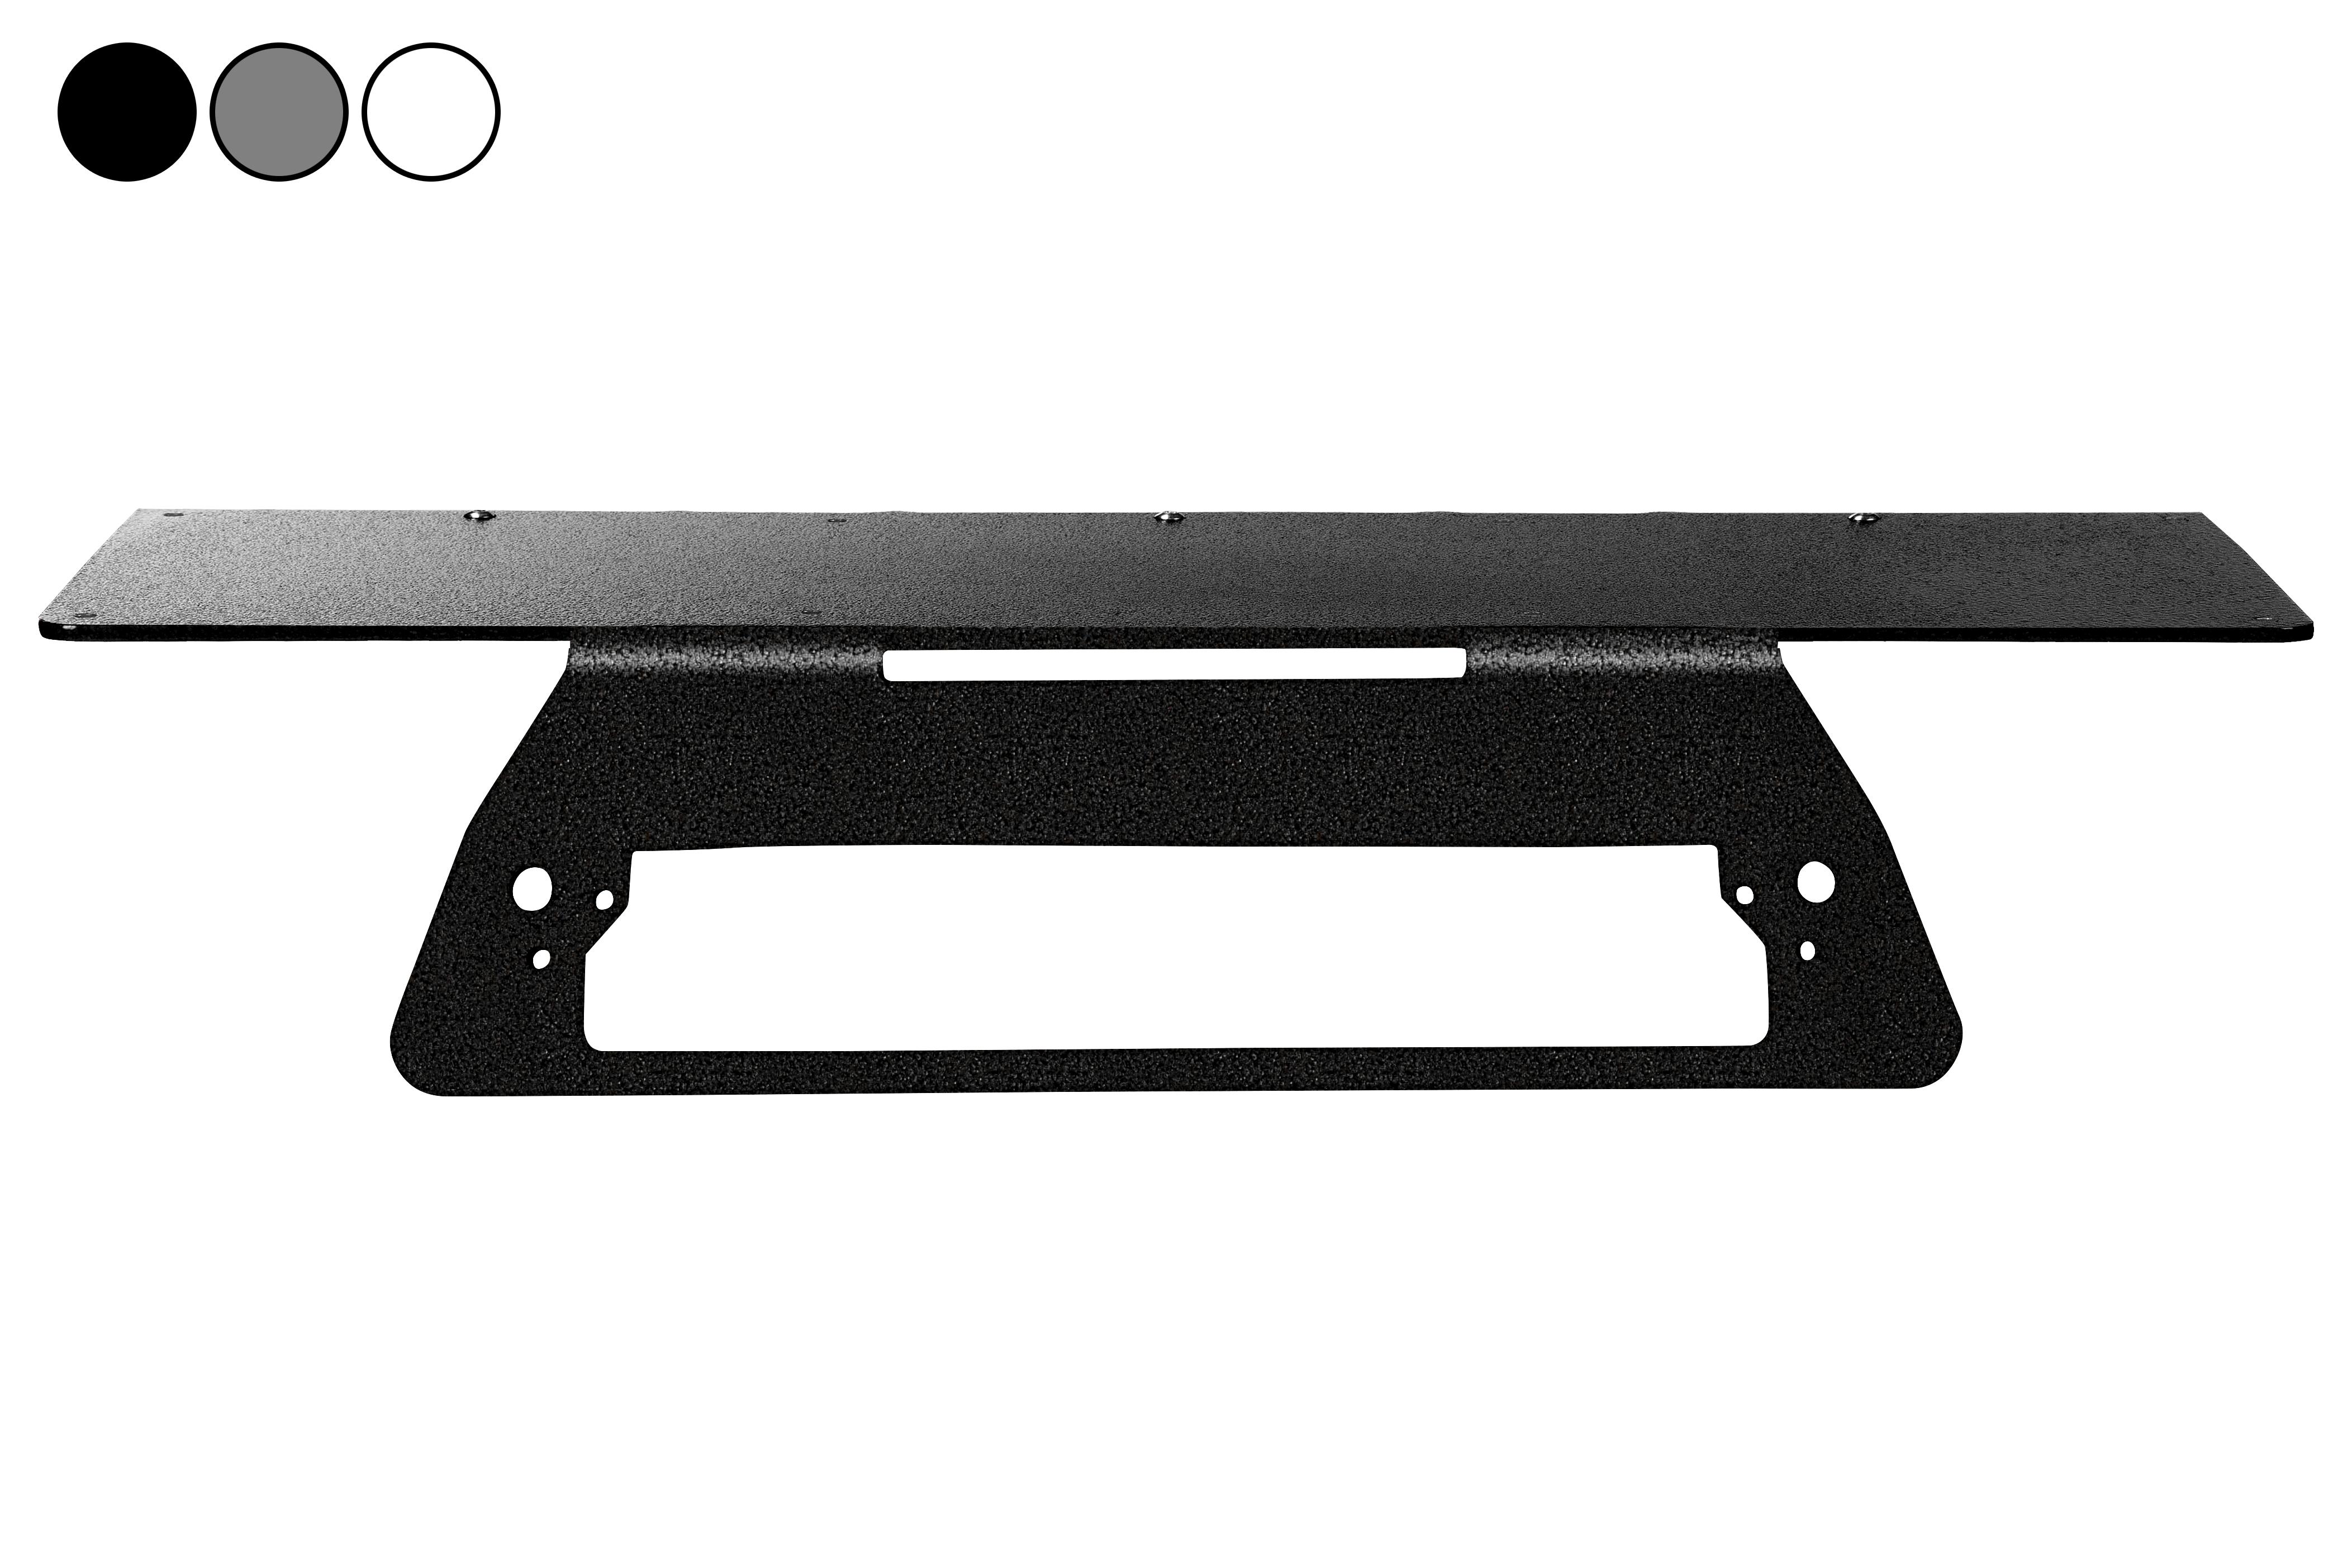 No Drill Mounting Plate, Fits 2019 Chevrolet Silverado 1500LD w/o Spoiler, Permanent